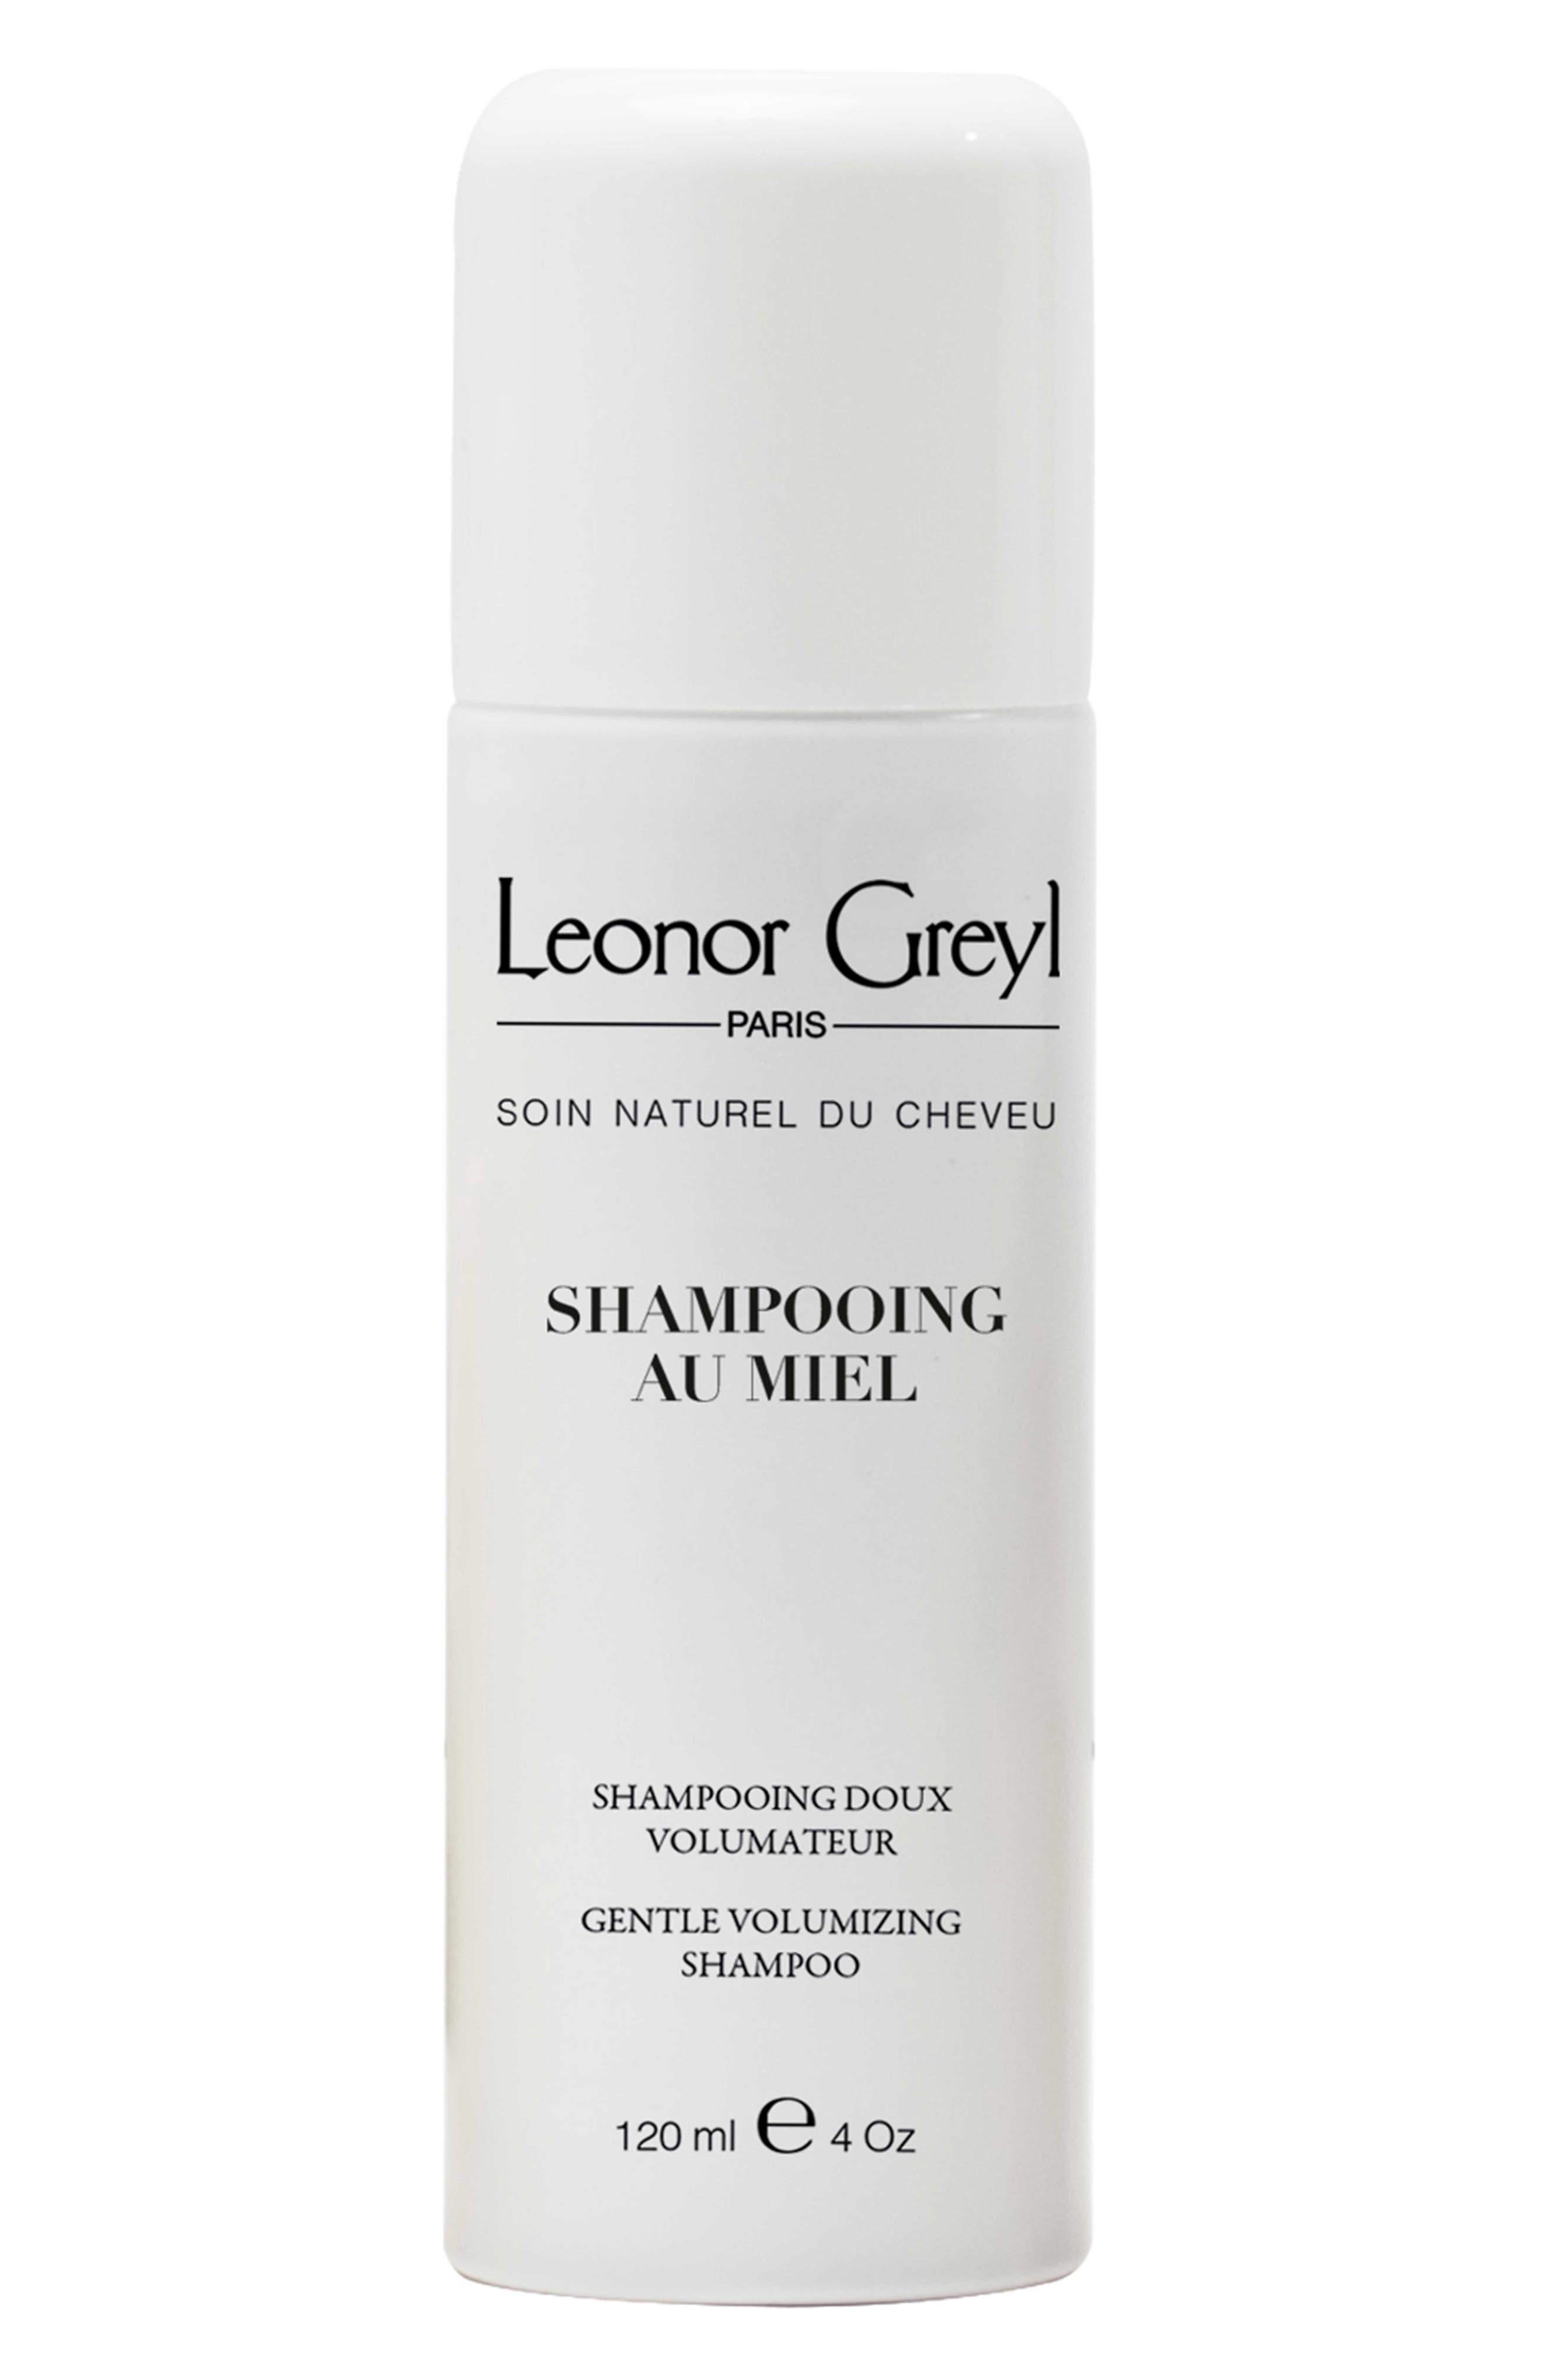 Leonor Greyl PARIS 'Shampooing au Miel' Volumizing Shampoo